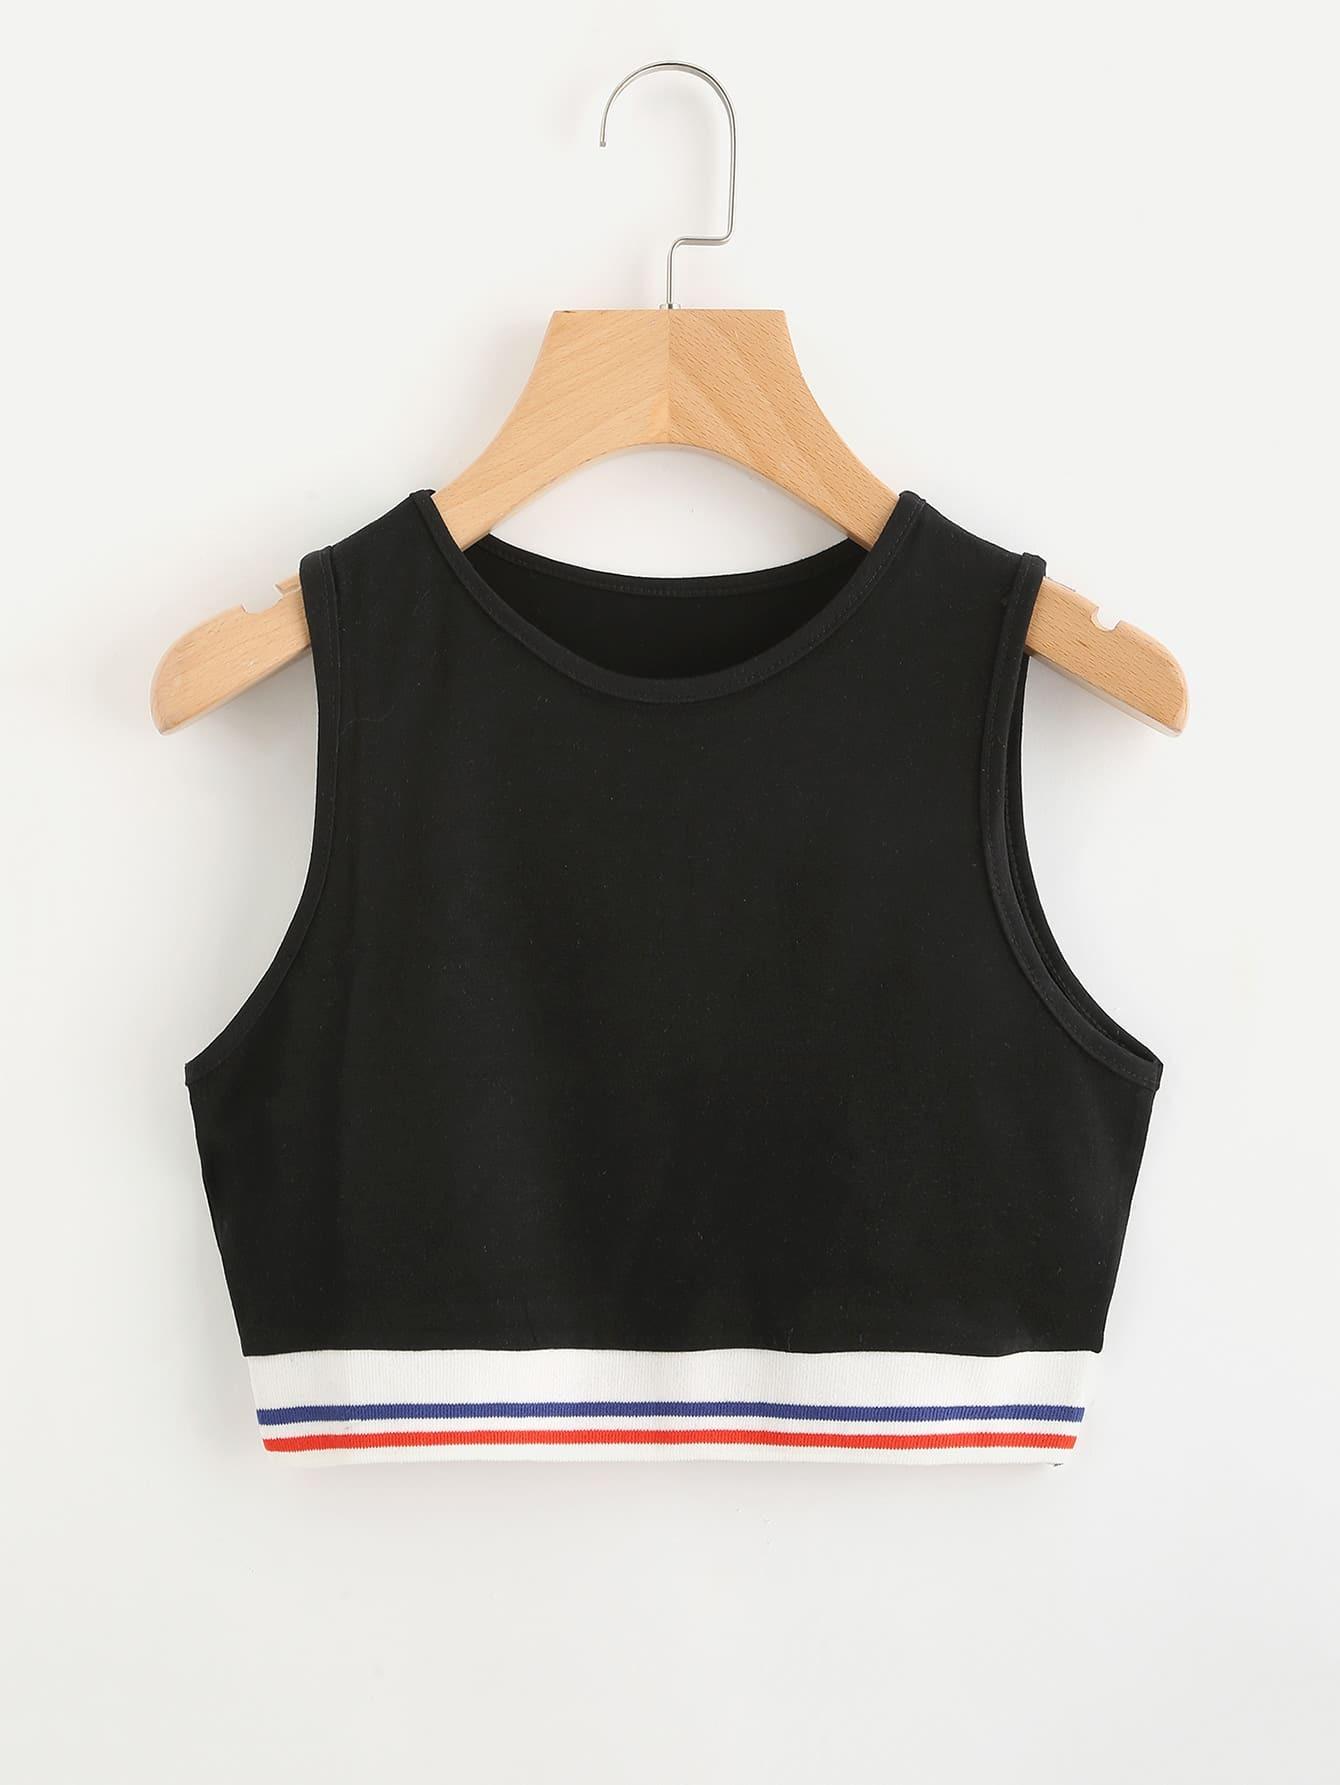 Contrast Striped Hem Crop Tank Top black choker sleeveless crop top